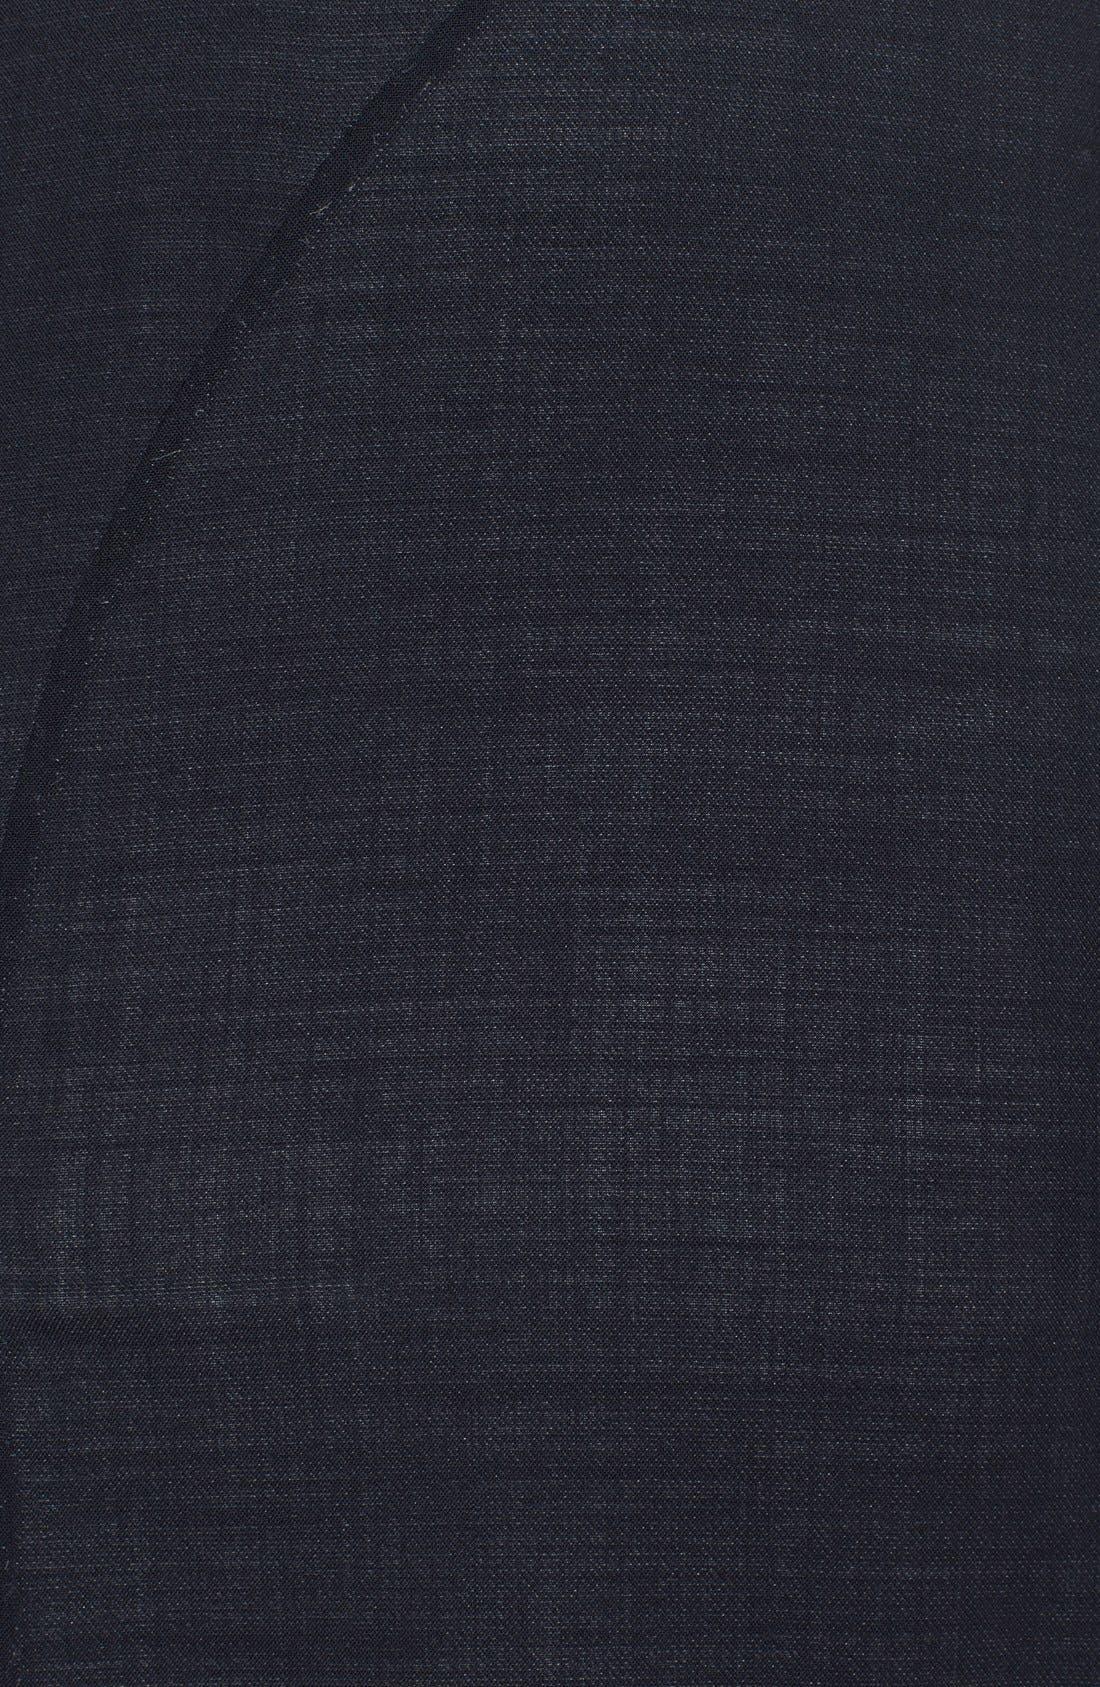 Alternate Image 3  - Oscar de la Renta Folded Double-Face Wool Blend Pencil Dress